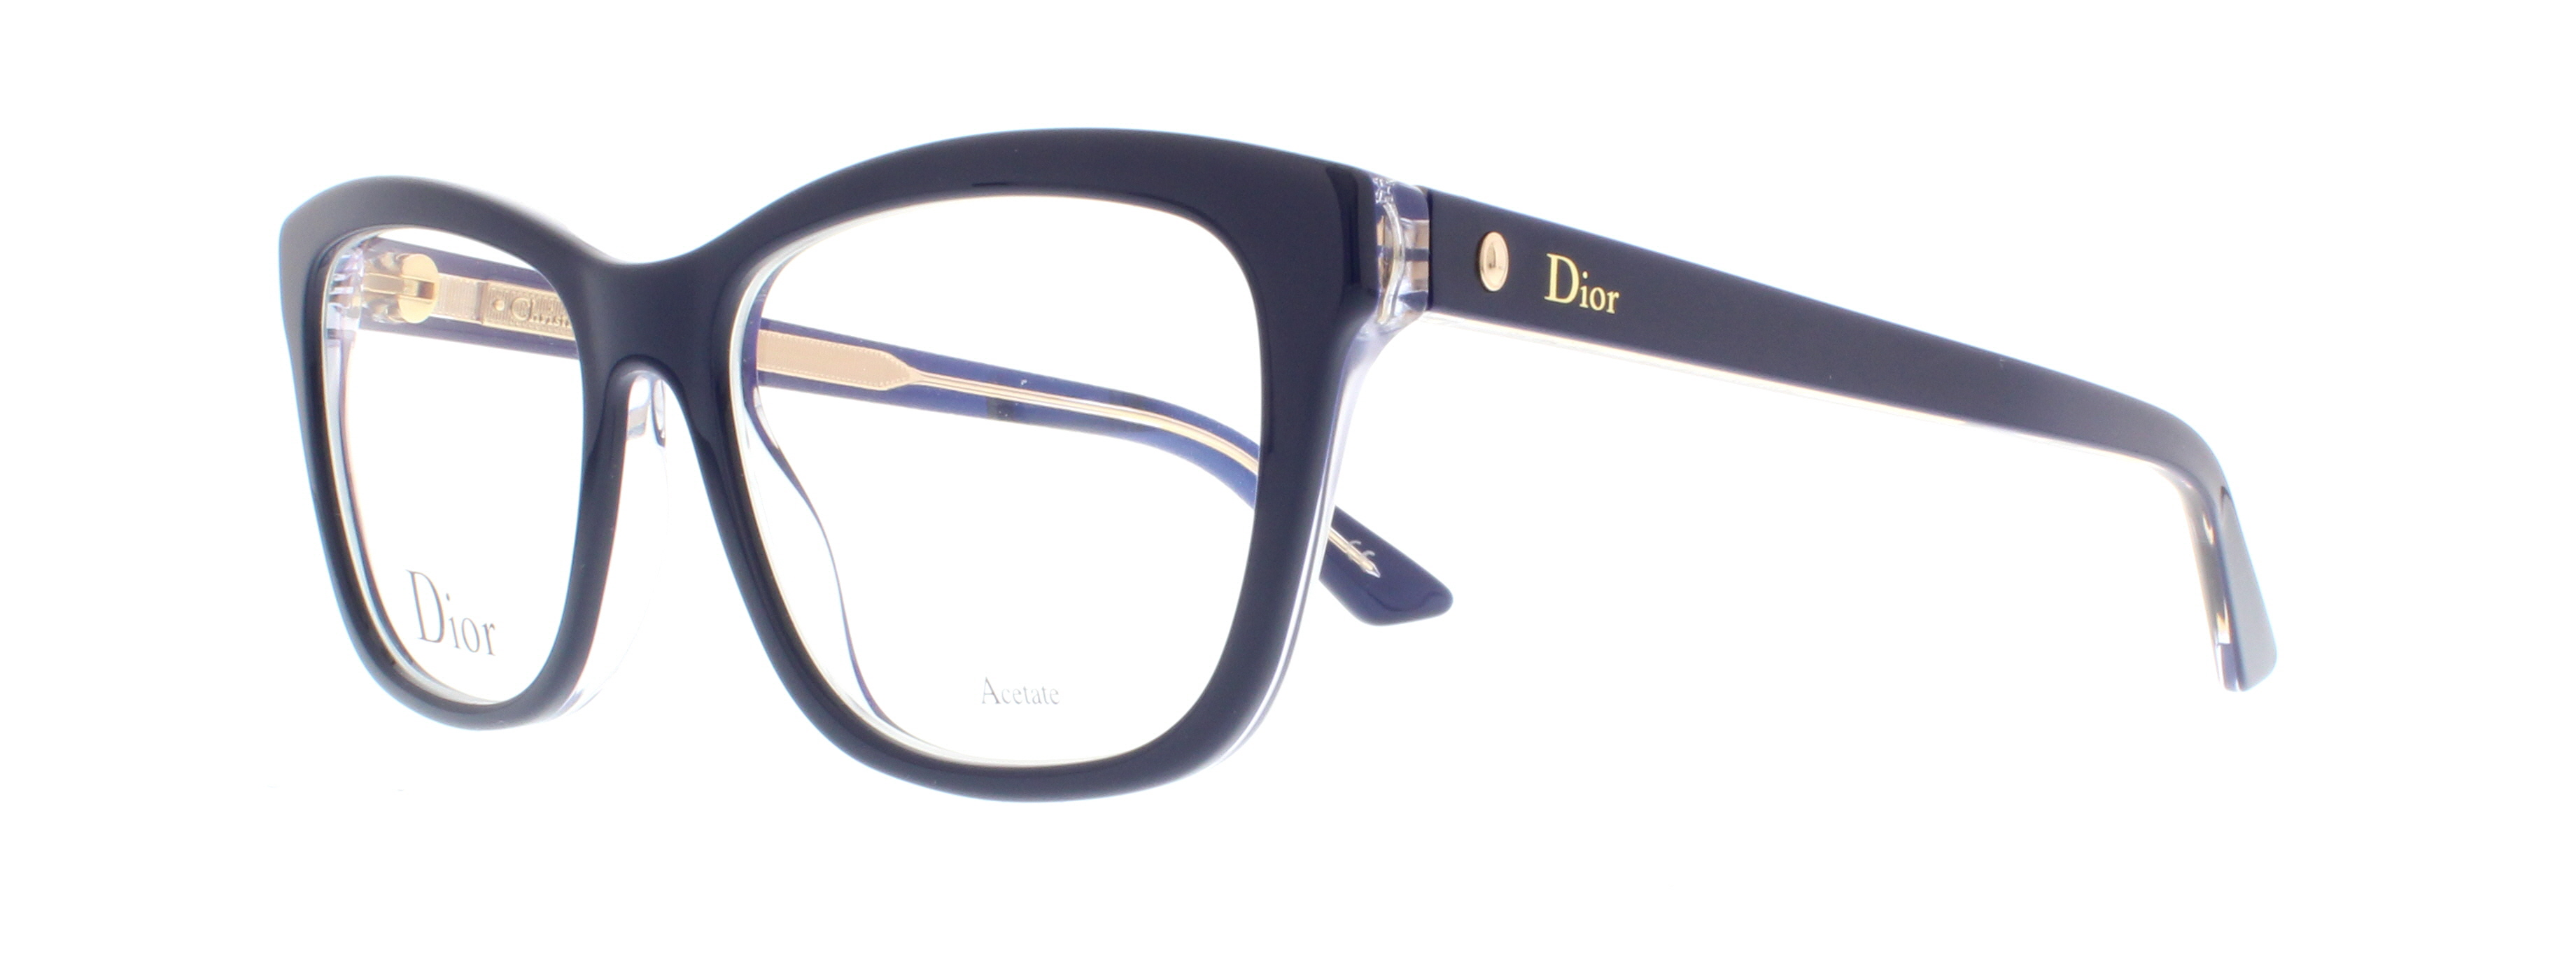 07be0195b9c Designer Frames Outlet. Dior MONTAIGNE 19